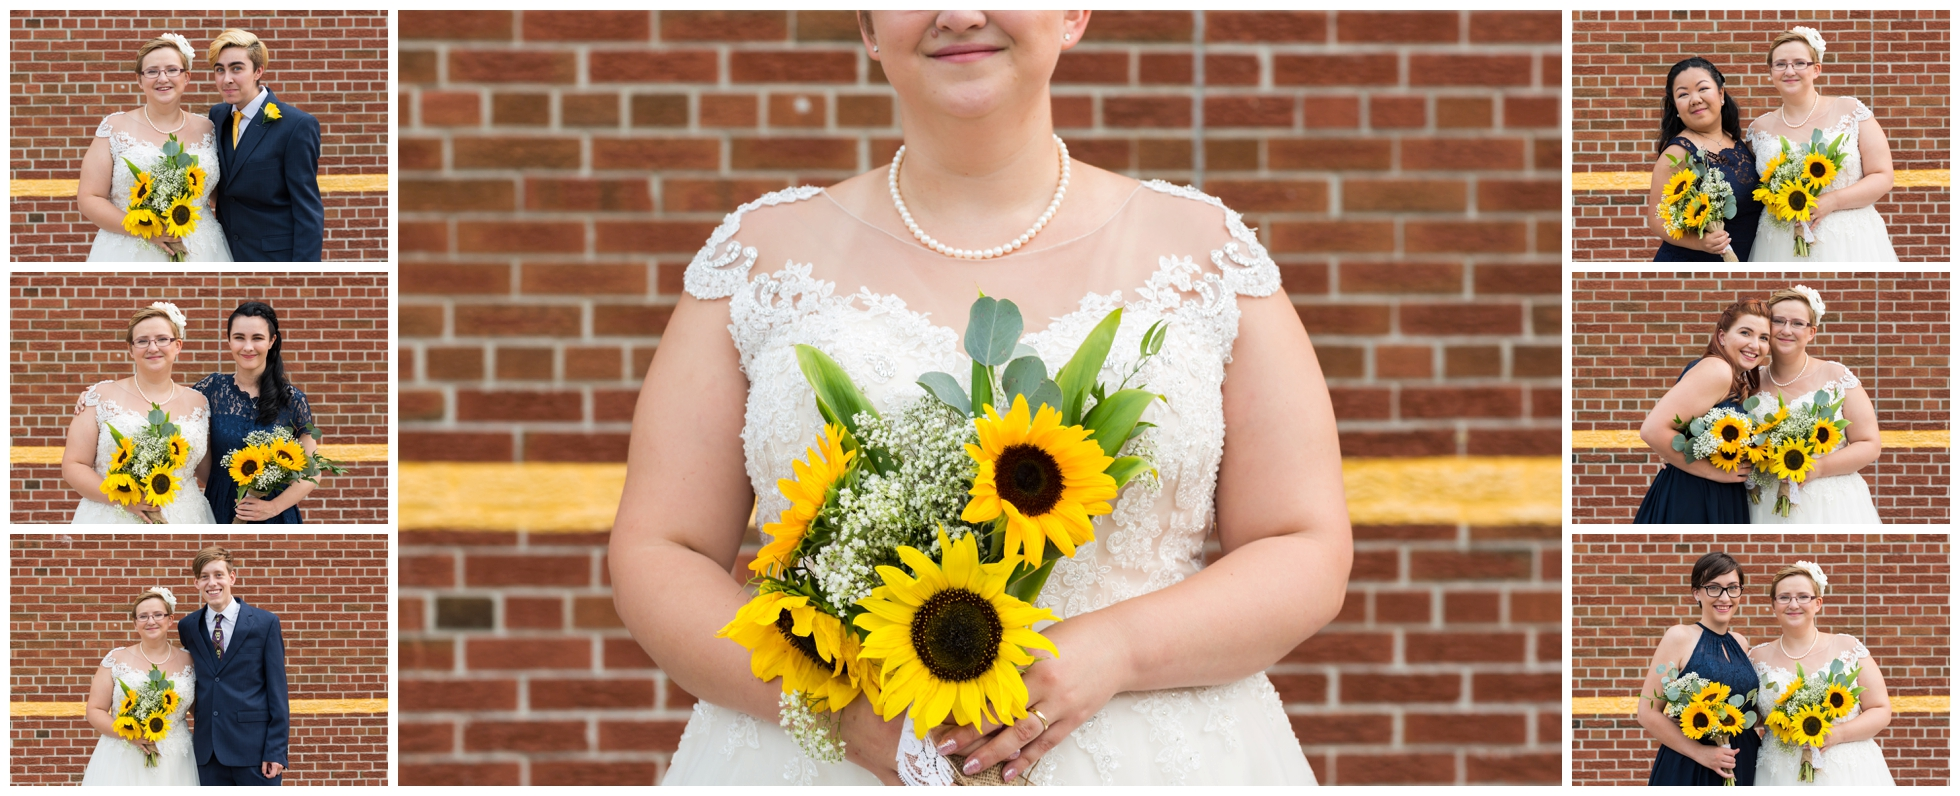 Toronto Wedding Chris Kate (Selena Phillips-Boyle)_0015.jpg